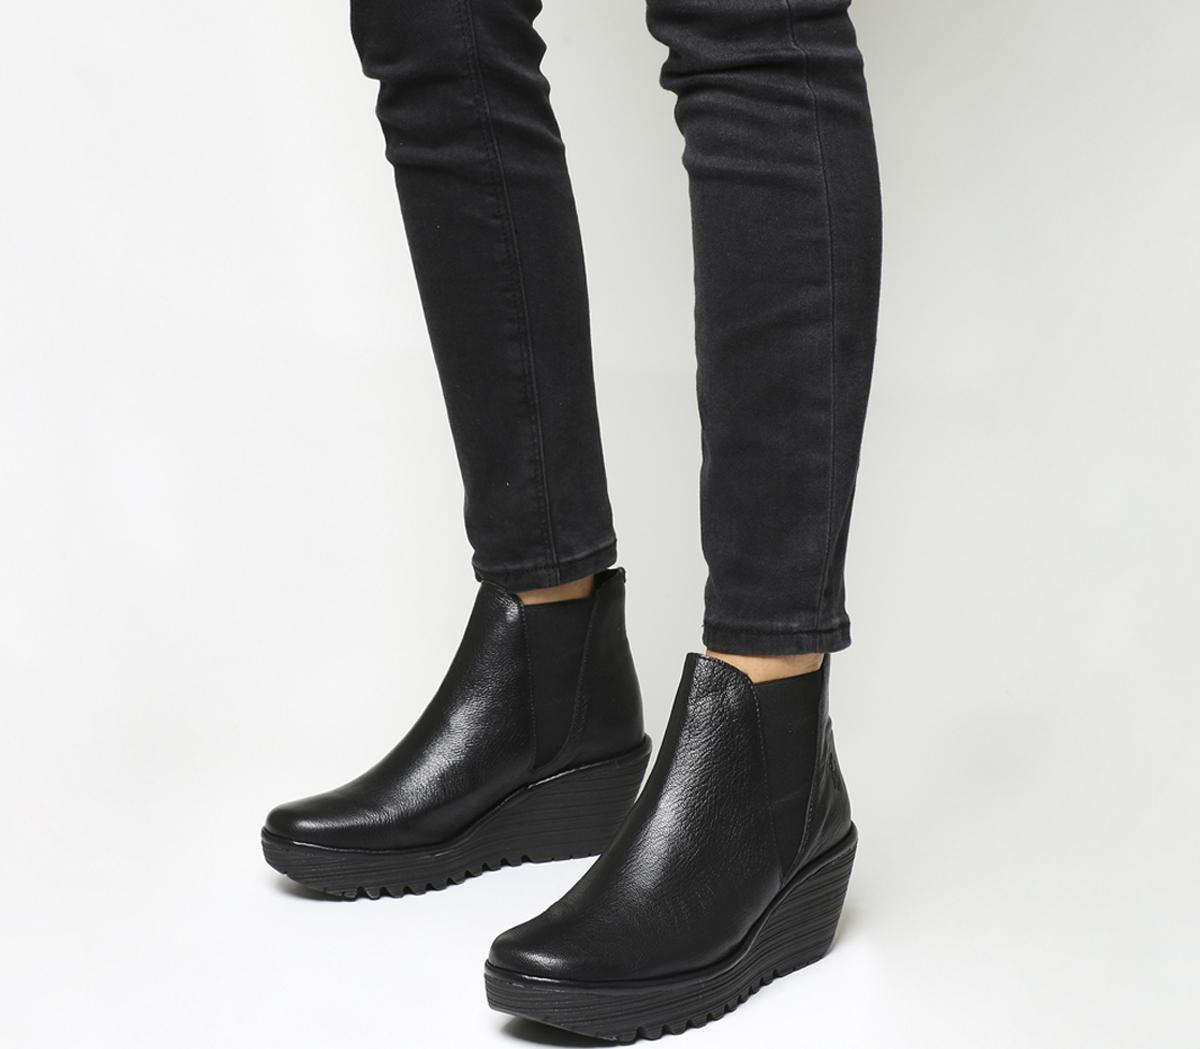 fly london yoss mousse women's boots leaking